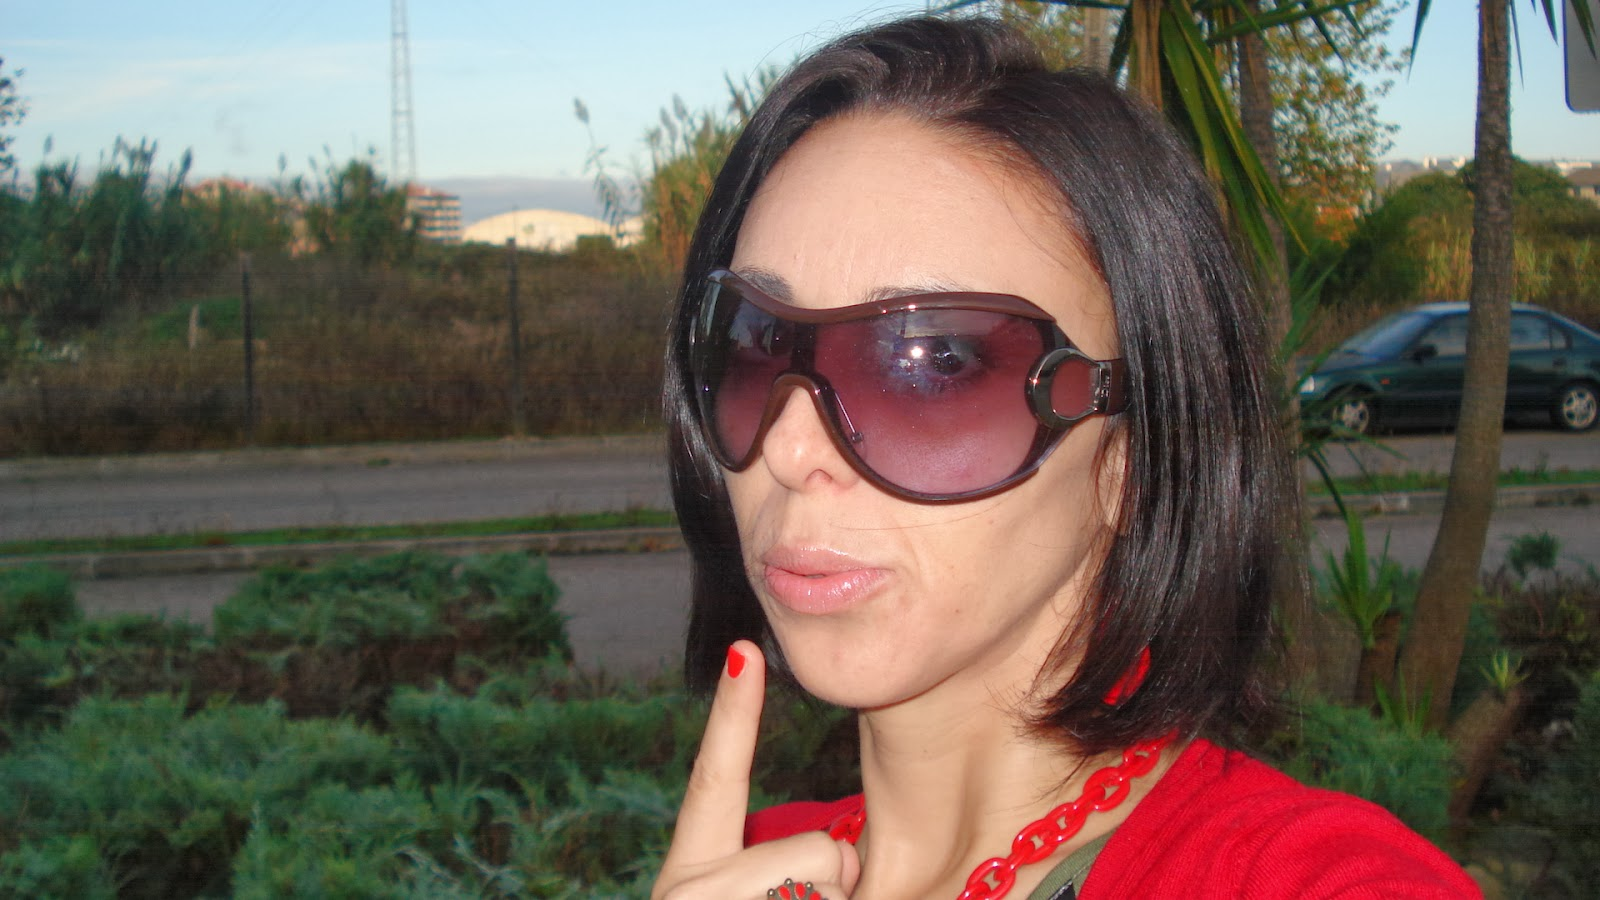 https://modanosapatinho.blogspot.com